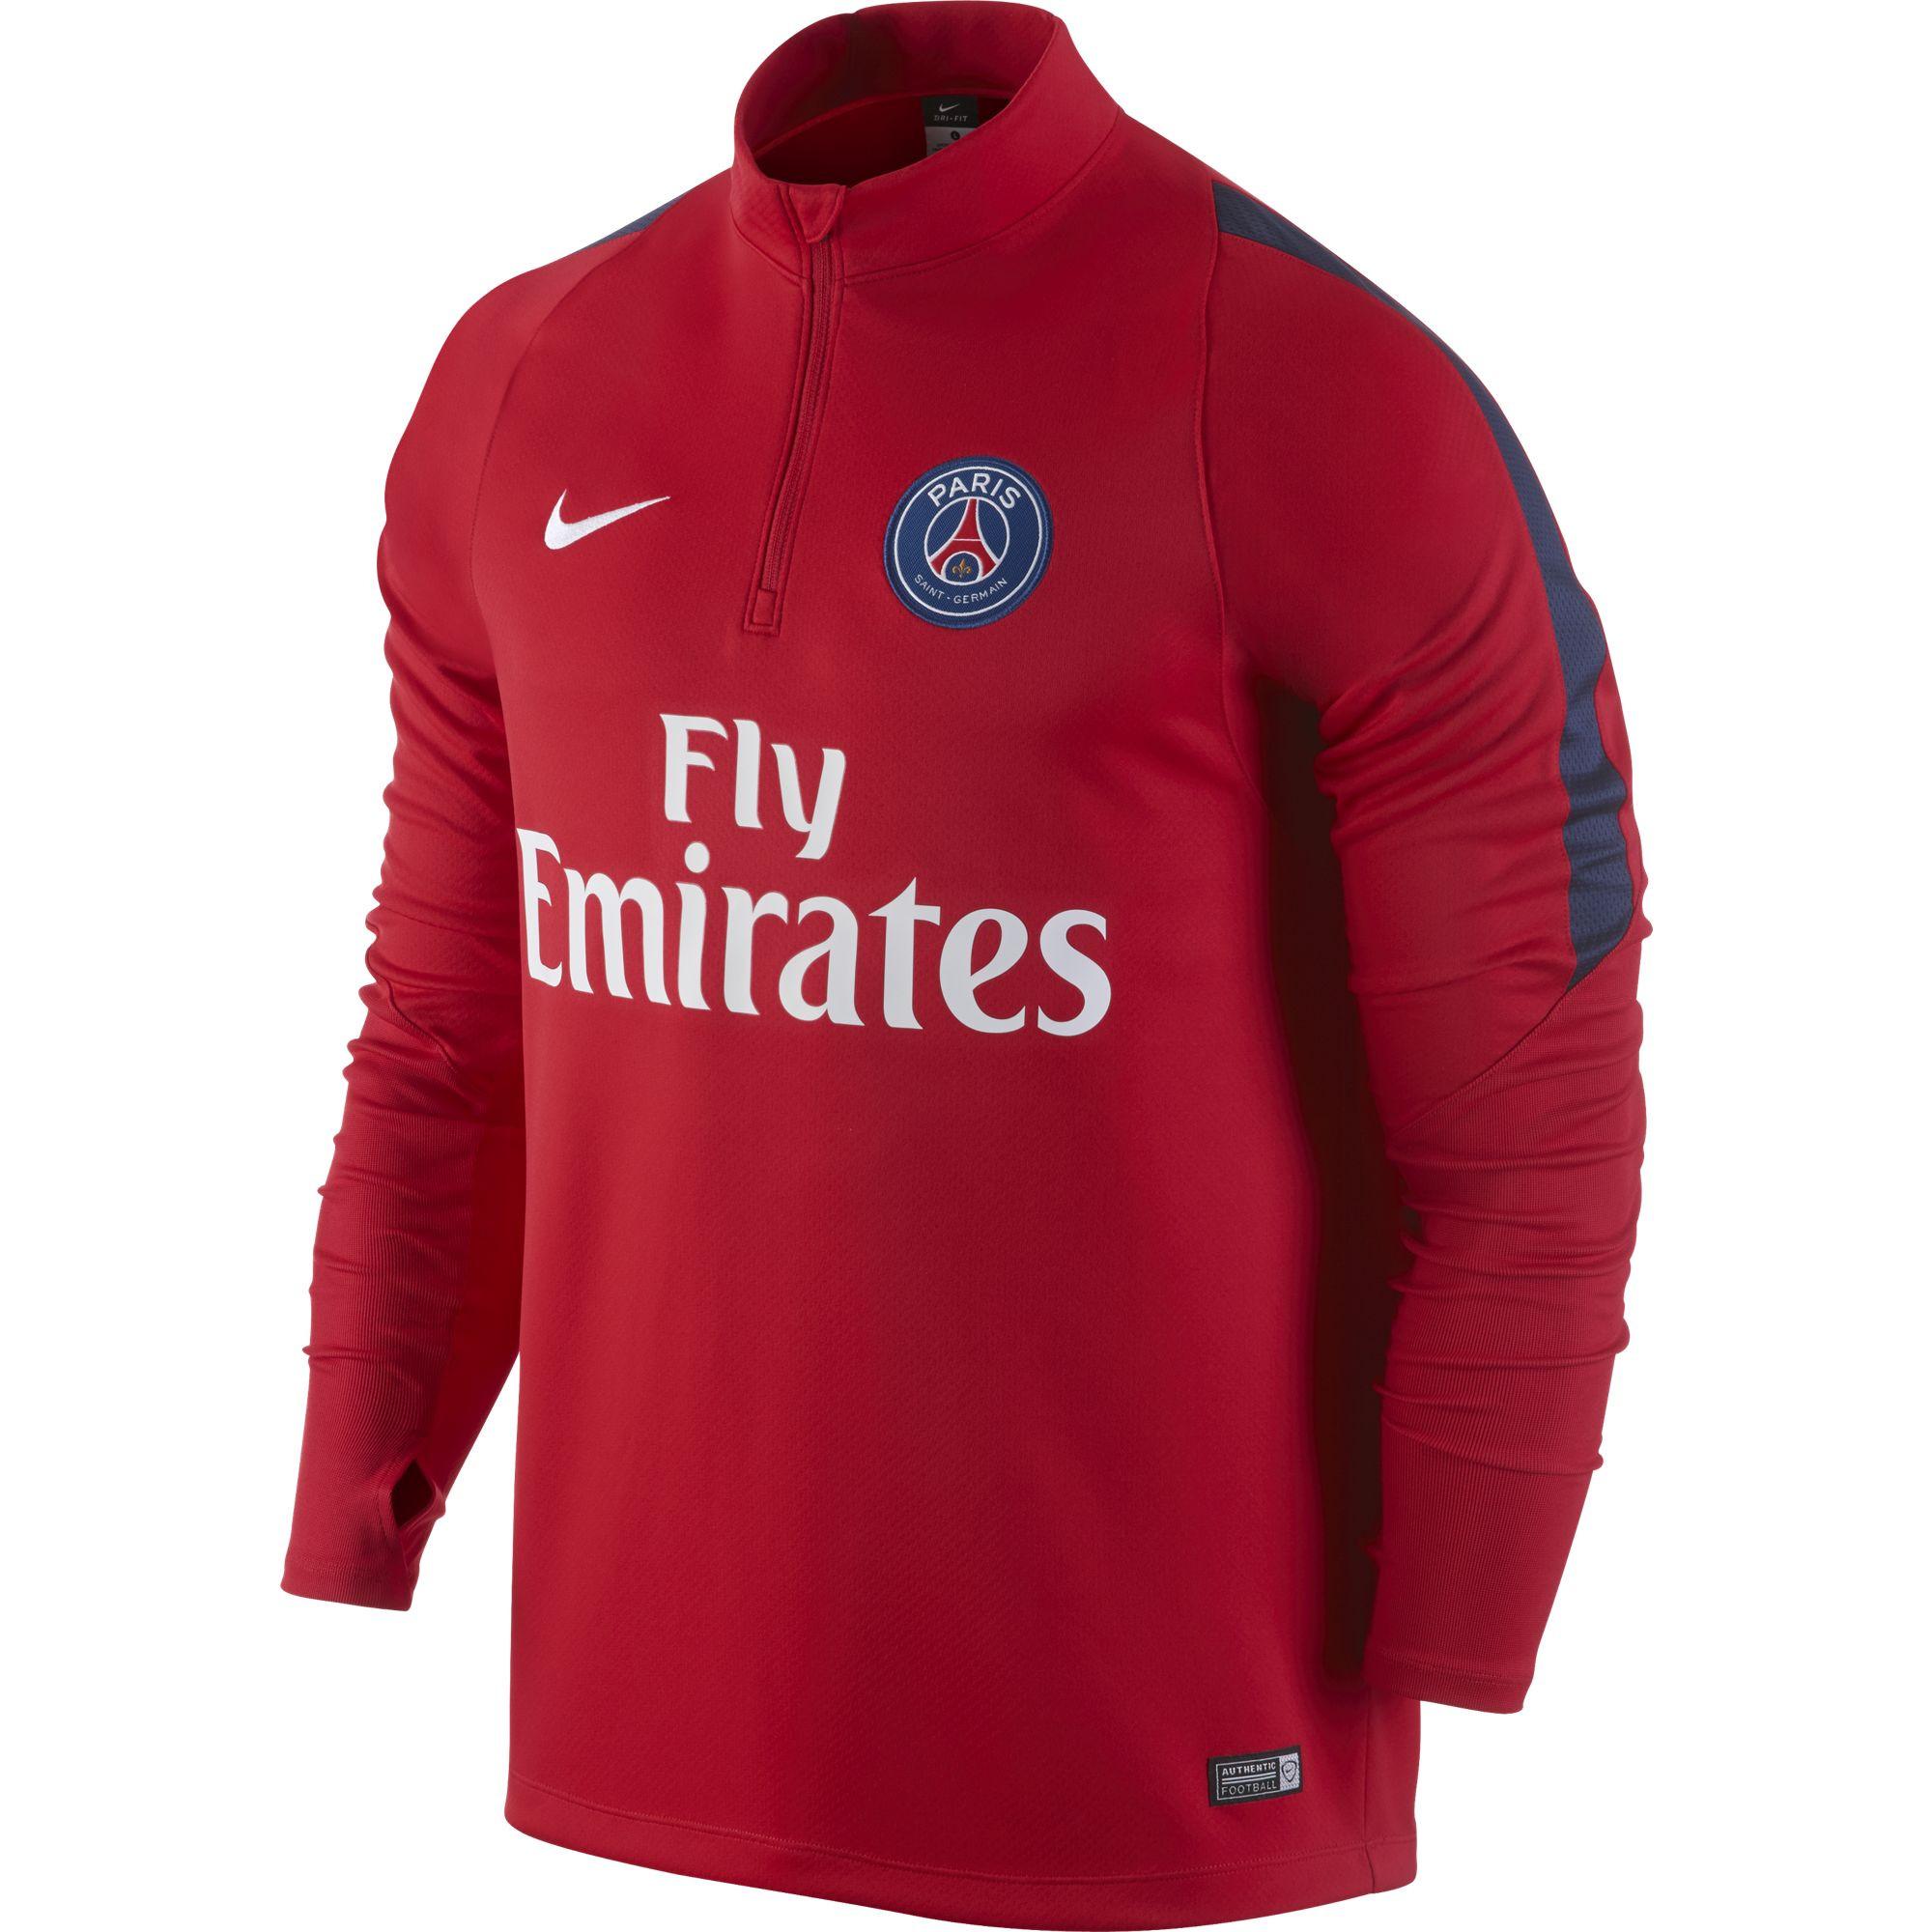 get cheap special section online retailer NIKE PSG SWEAT ENTRAINEMENT ROUGE 2016 - PSG - CLUB FRANCAIS